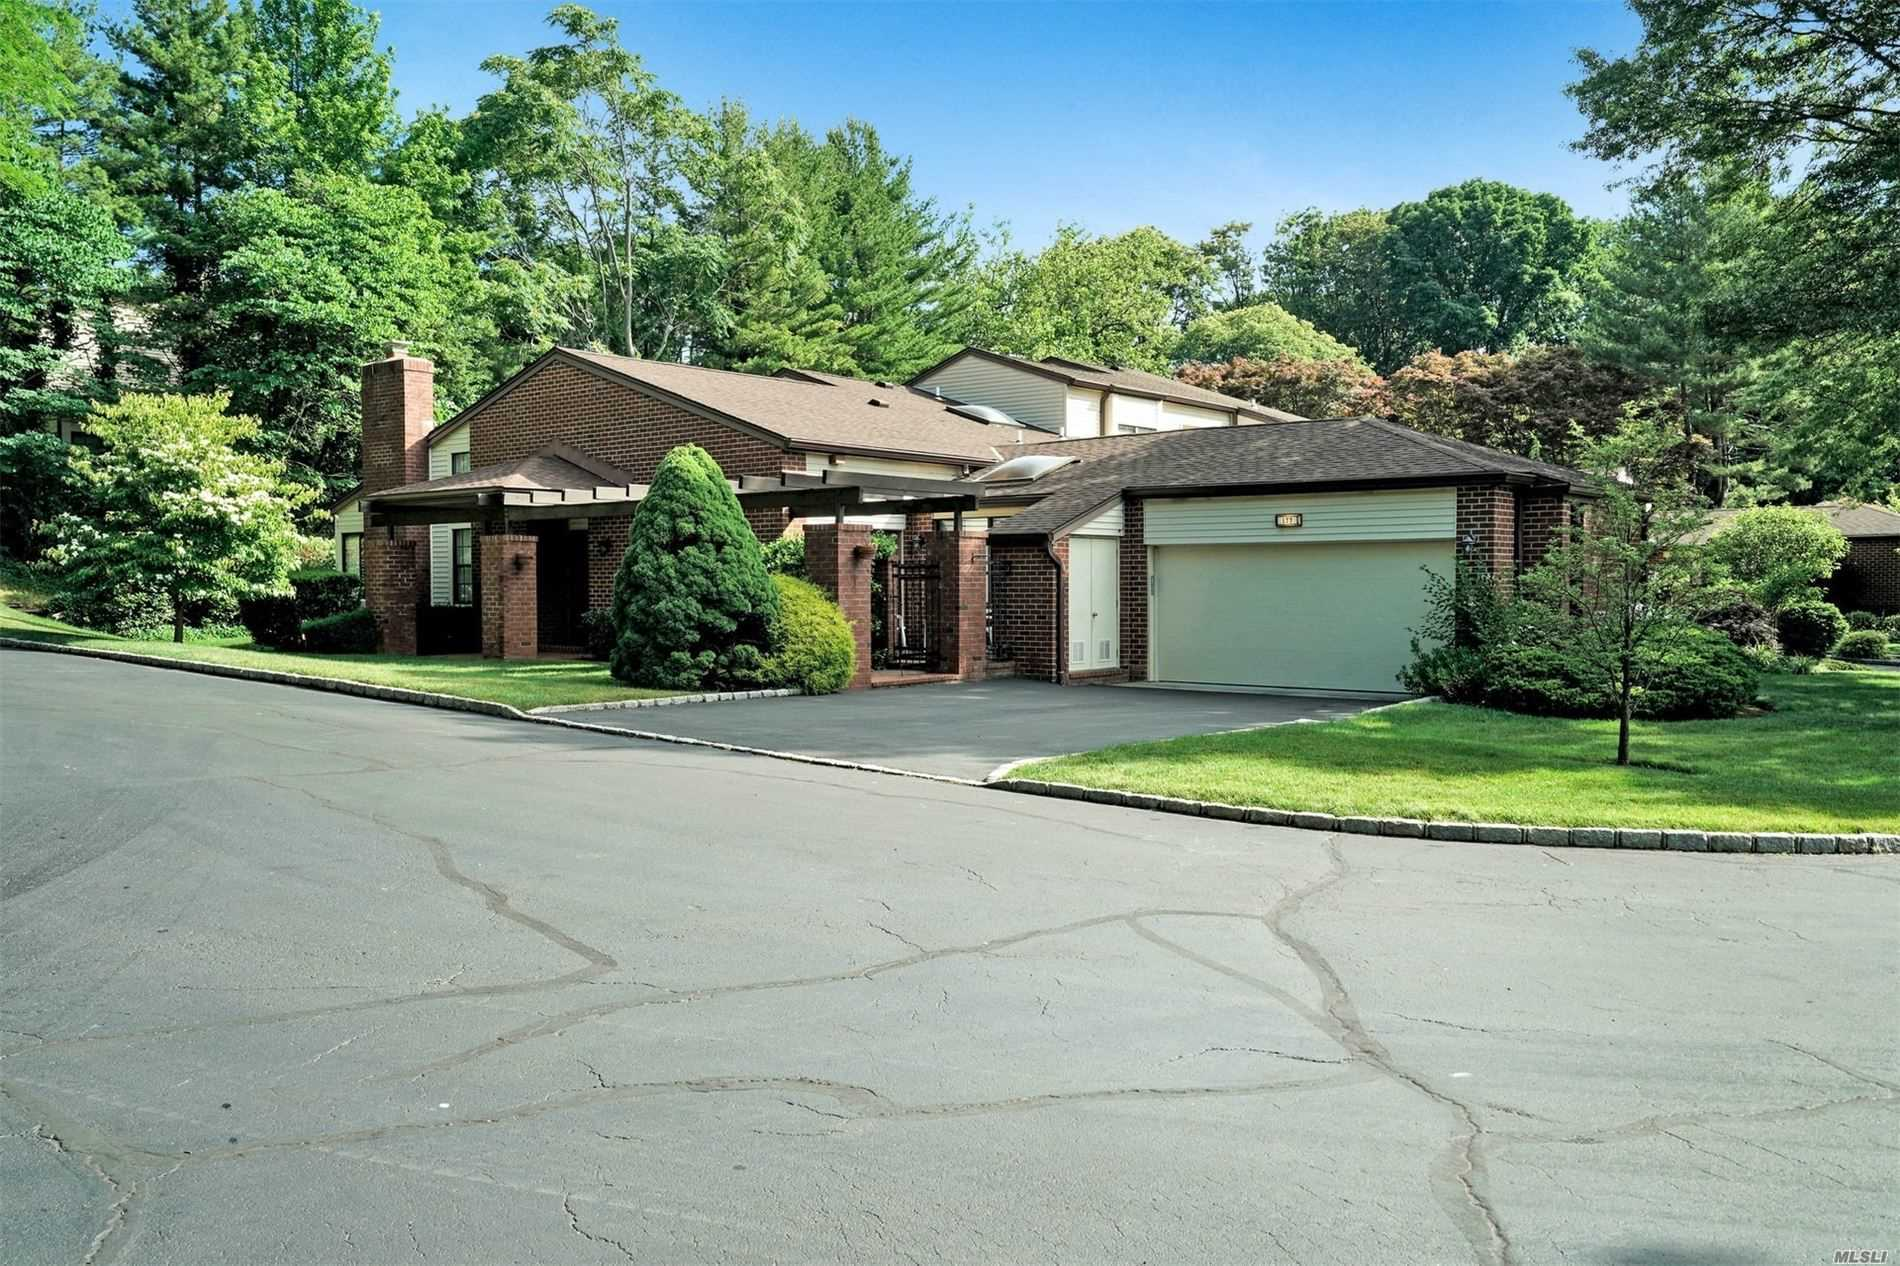 Property for sale at 177 Gannet Court, Manhasset,  New York 11030